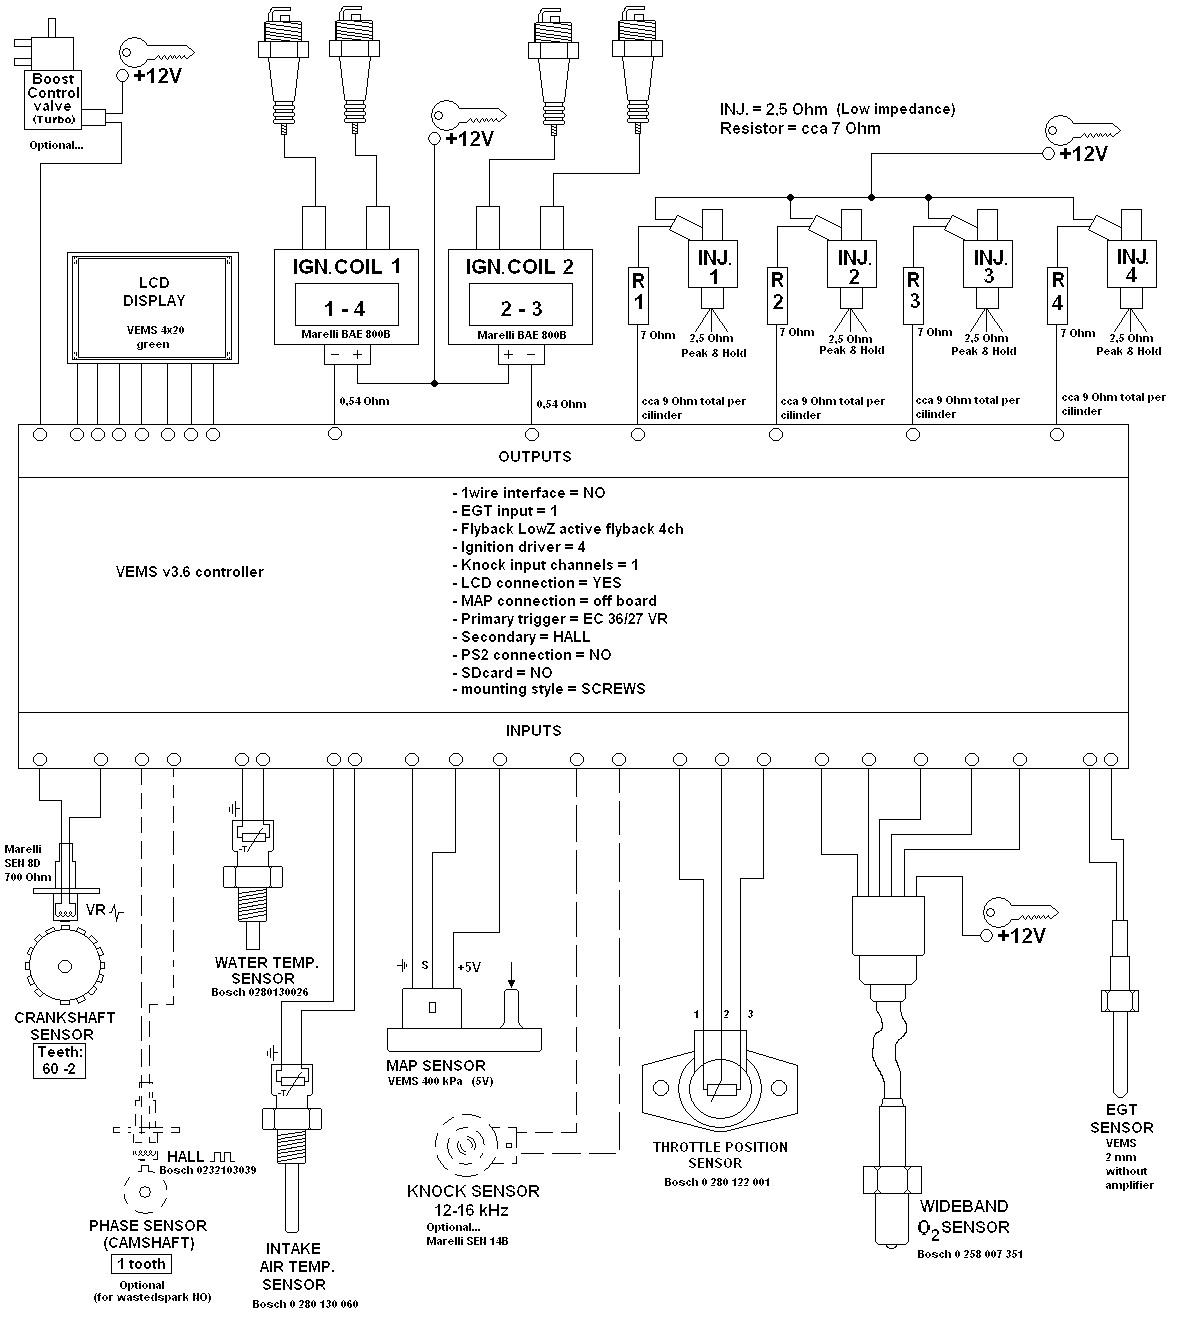 bosch map sensor wiring diagram 12v toggle switch index of files lanciaslovakia